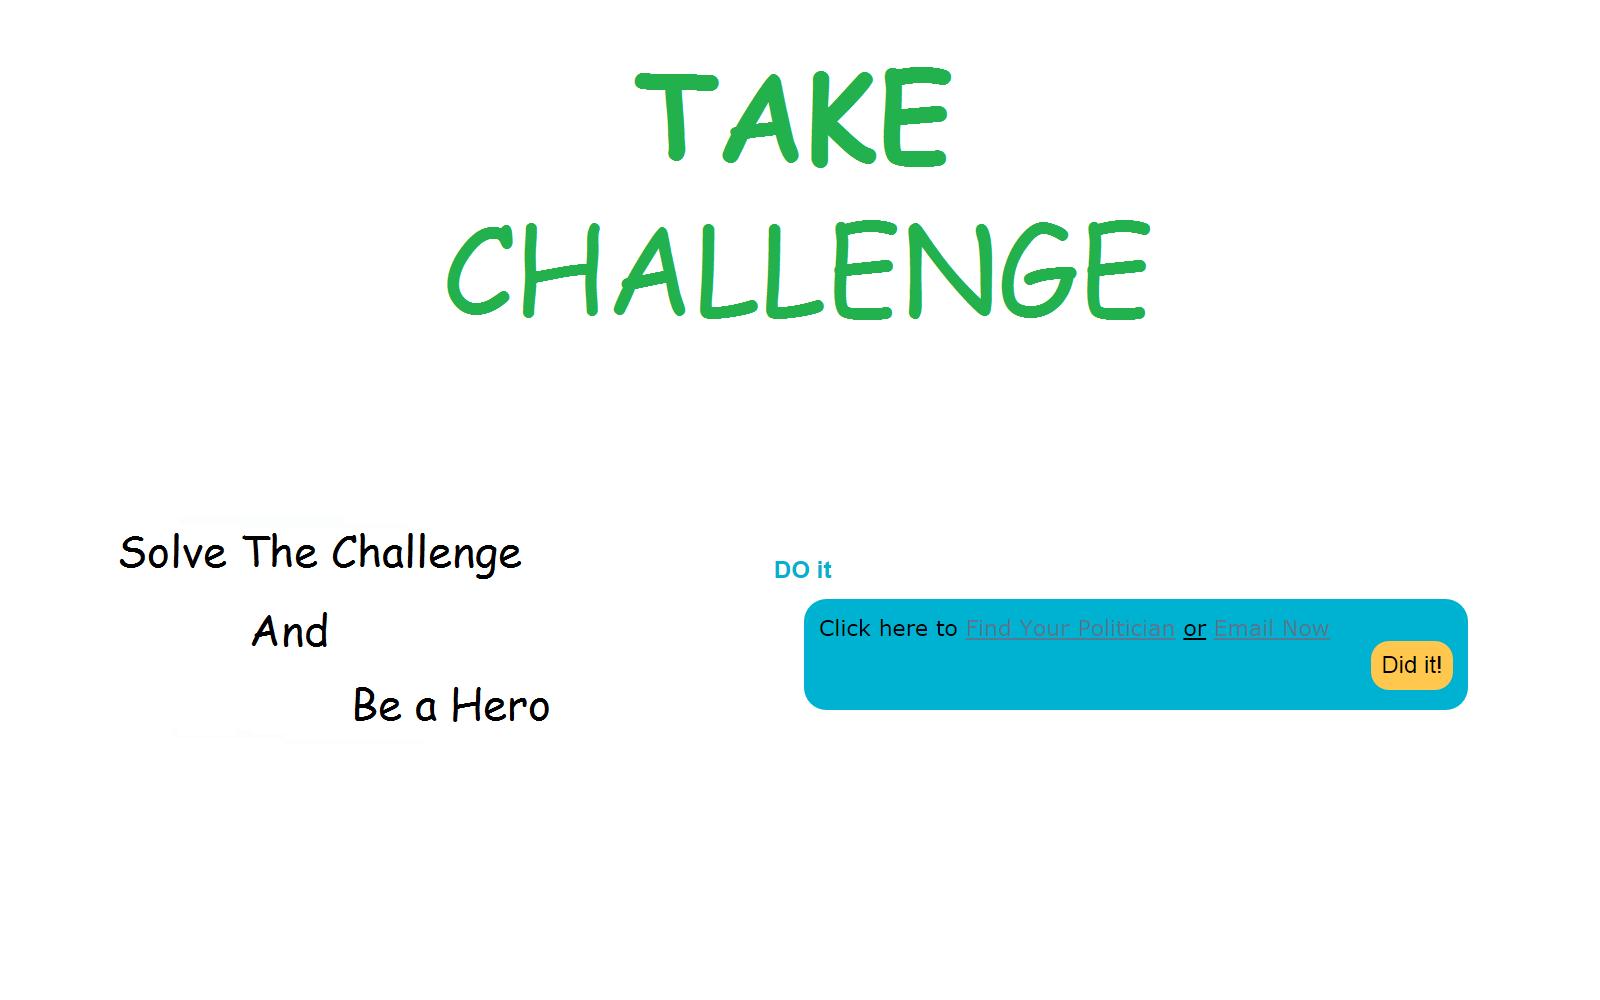 3 - Take The Challenge